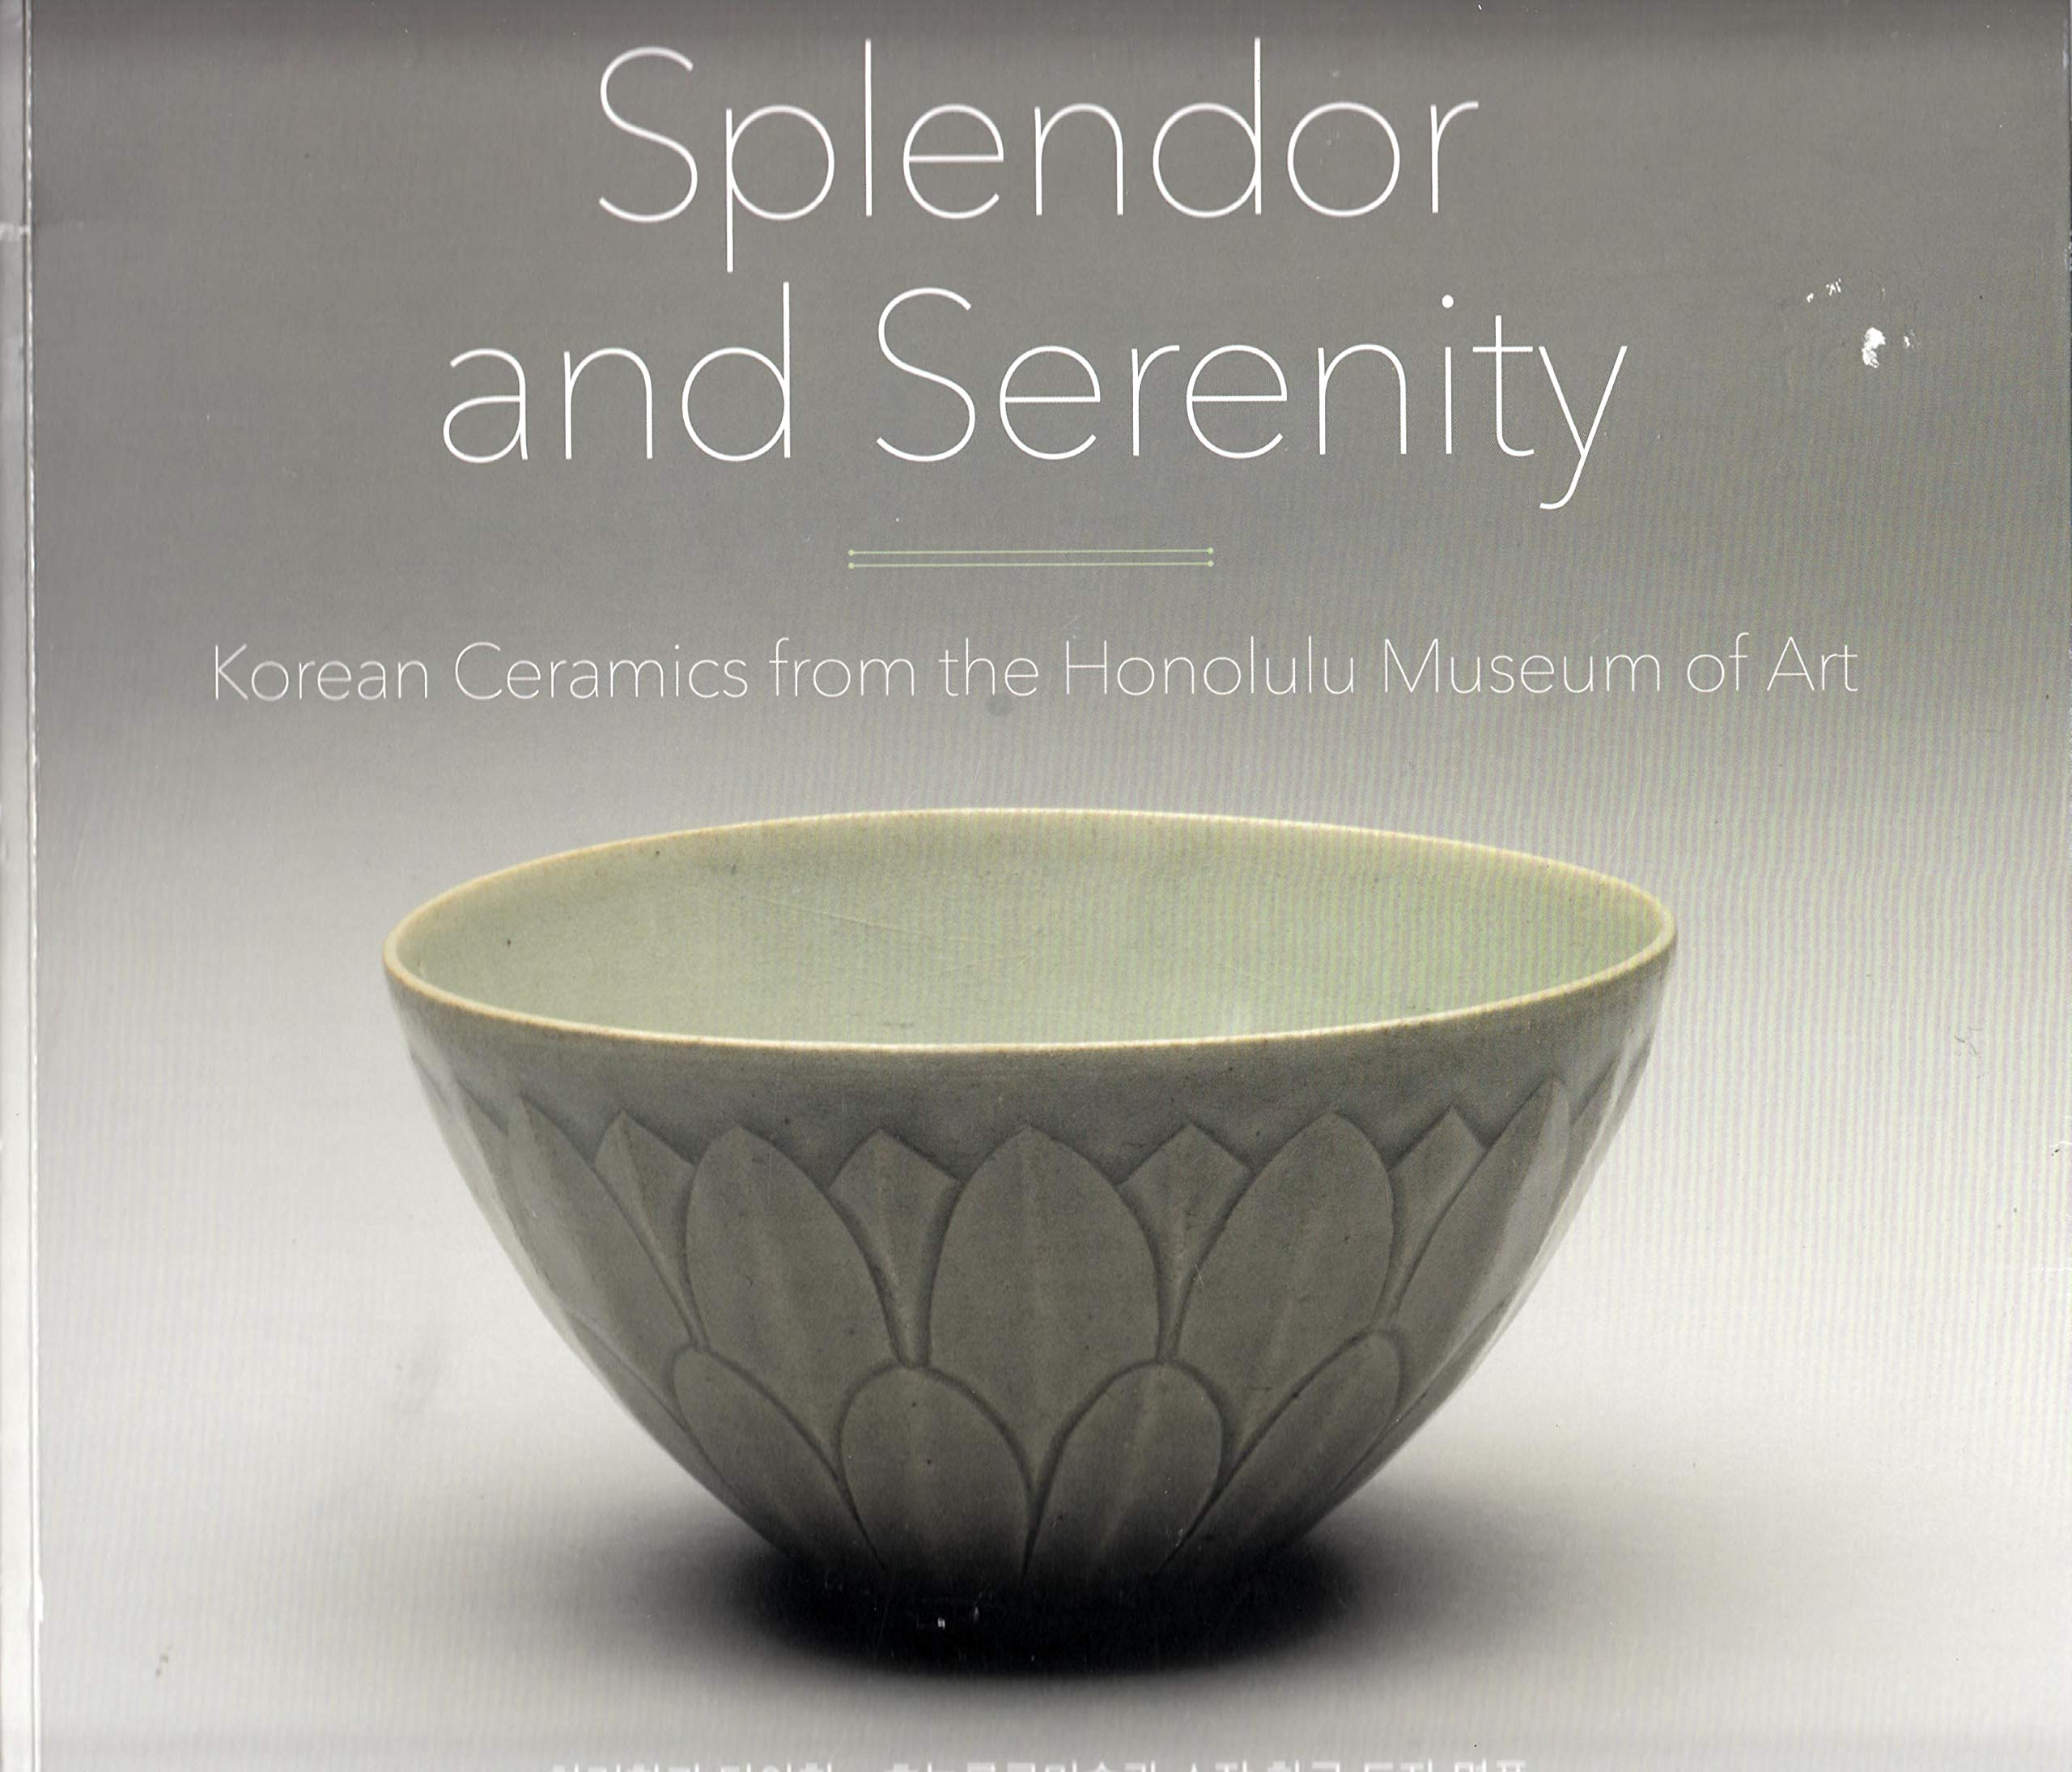 Splendor and Serenity: Korean Ceramics from the Honolulu Museum of Art